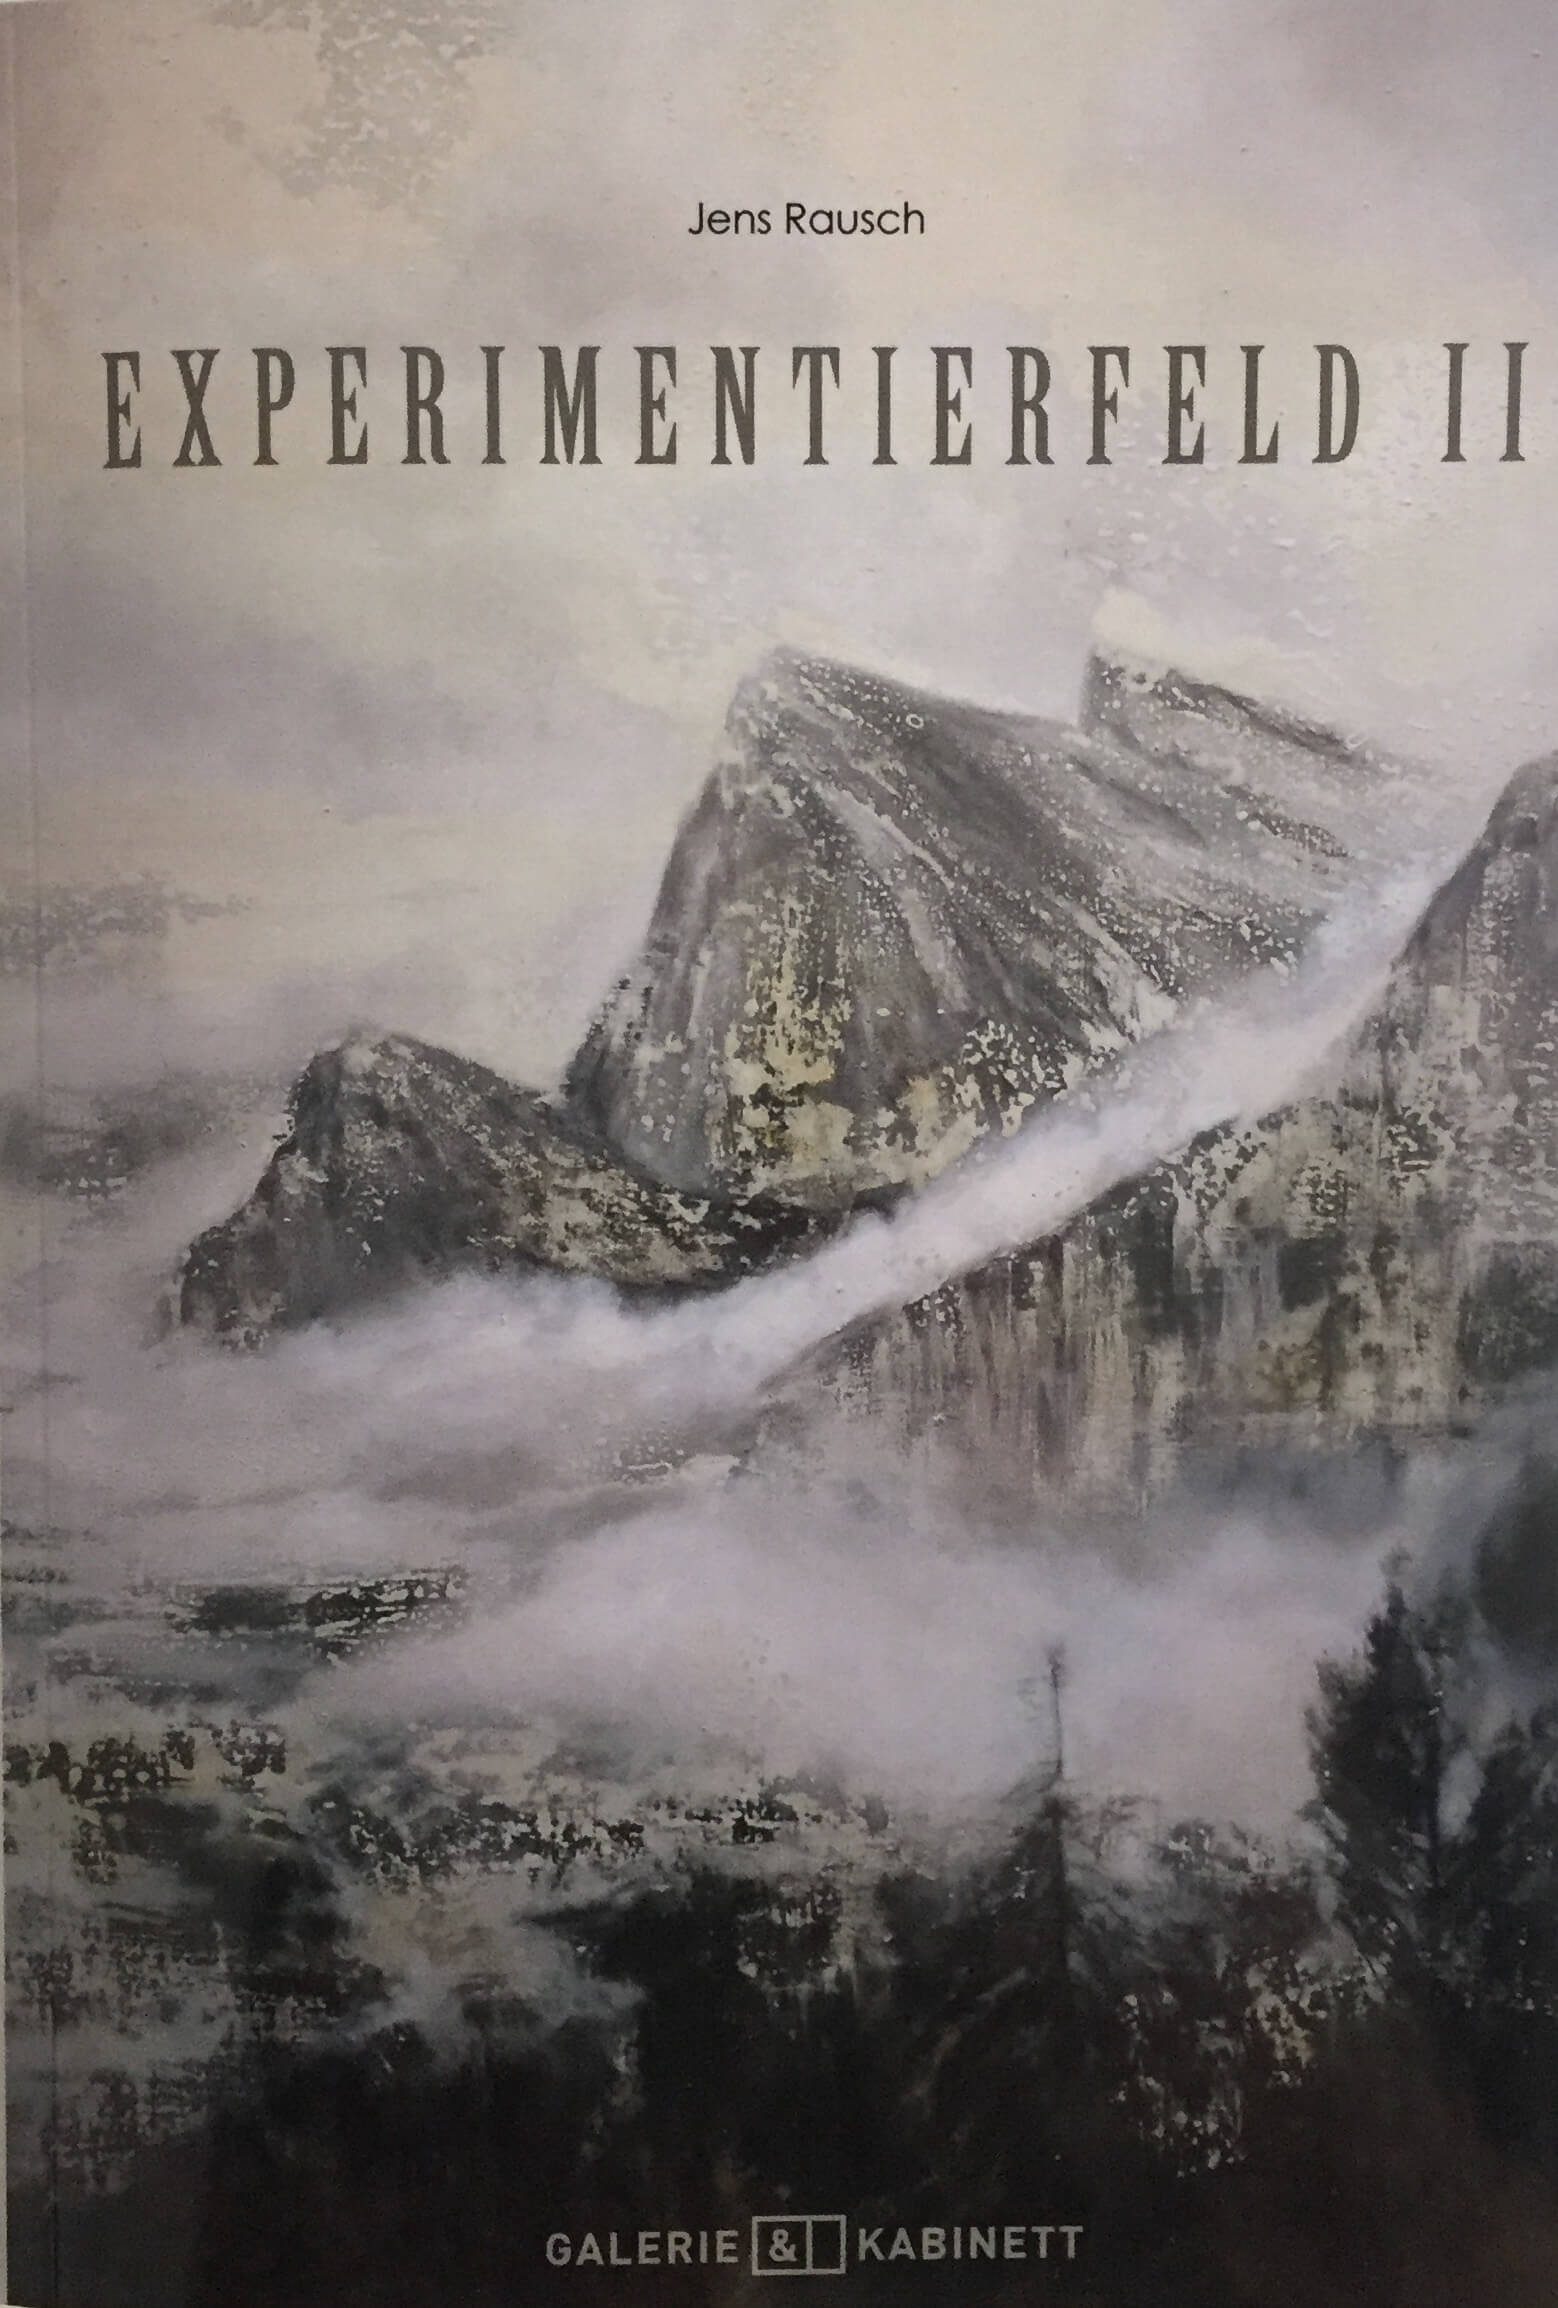 JENS RAUSCH – EXPERIMENTIERFELD II